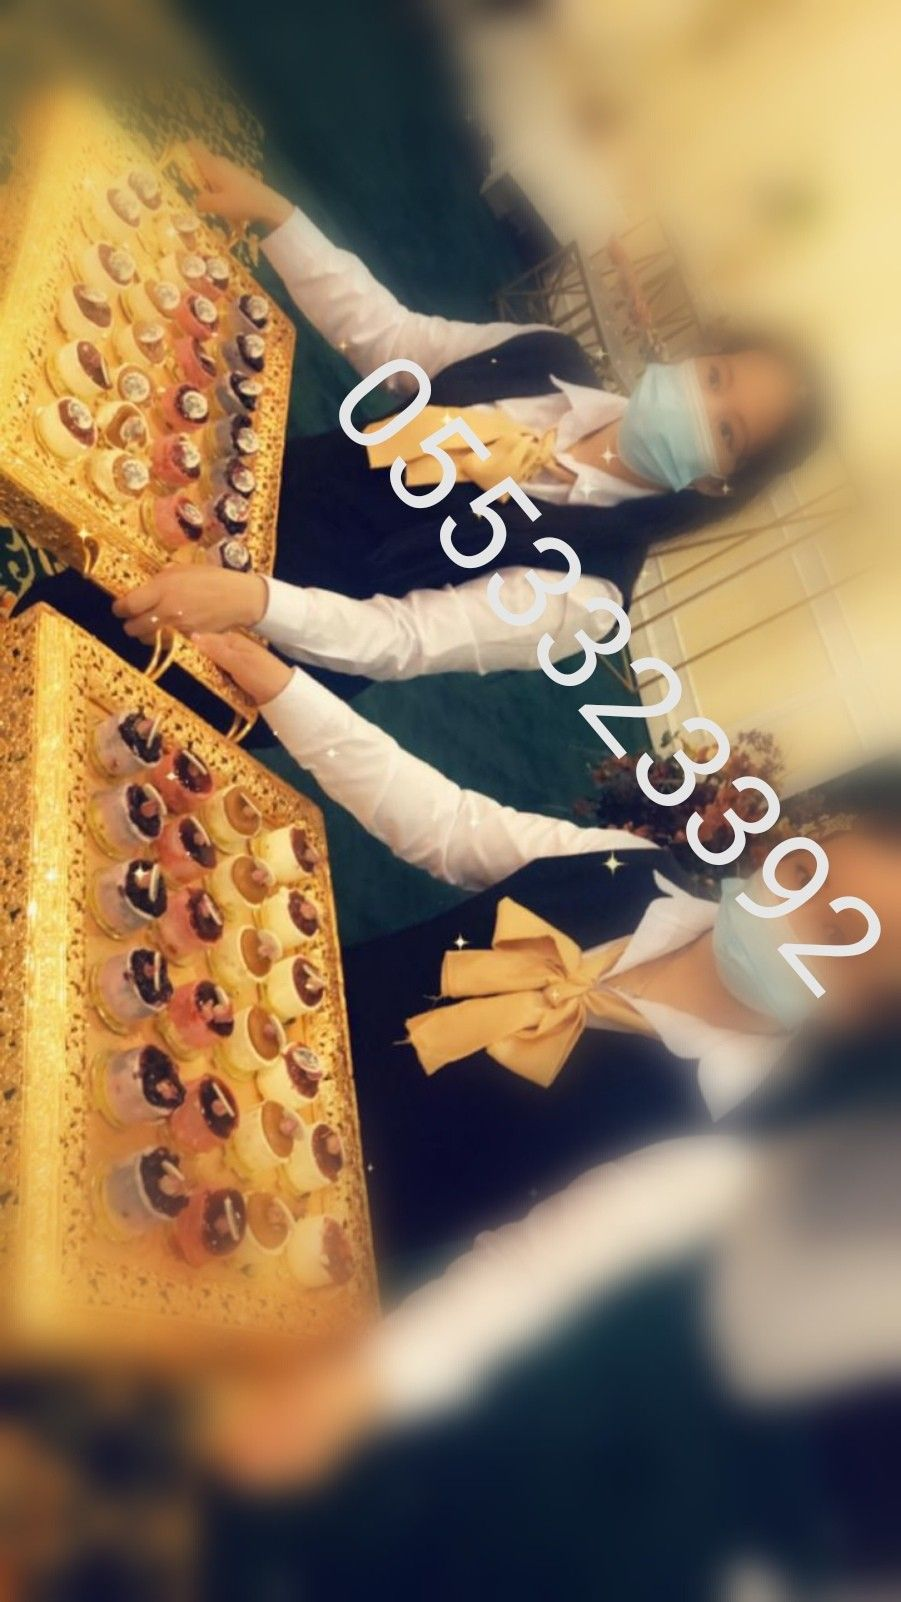 Pin By مباشرين ومباشرات الدمام الخبر On قهوجيات الدمام والخبر وجميع مدن الشرقيه 0553323392 Sequins Fashion Sequin Skirt